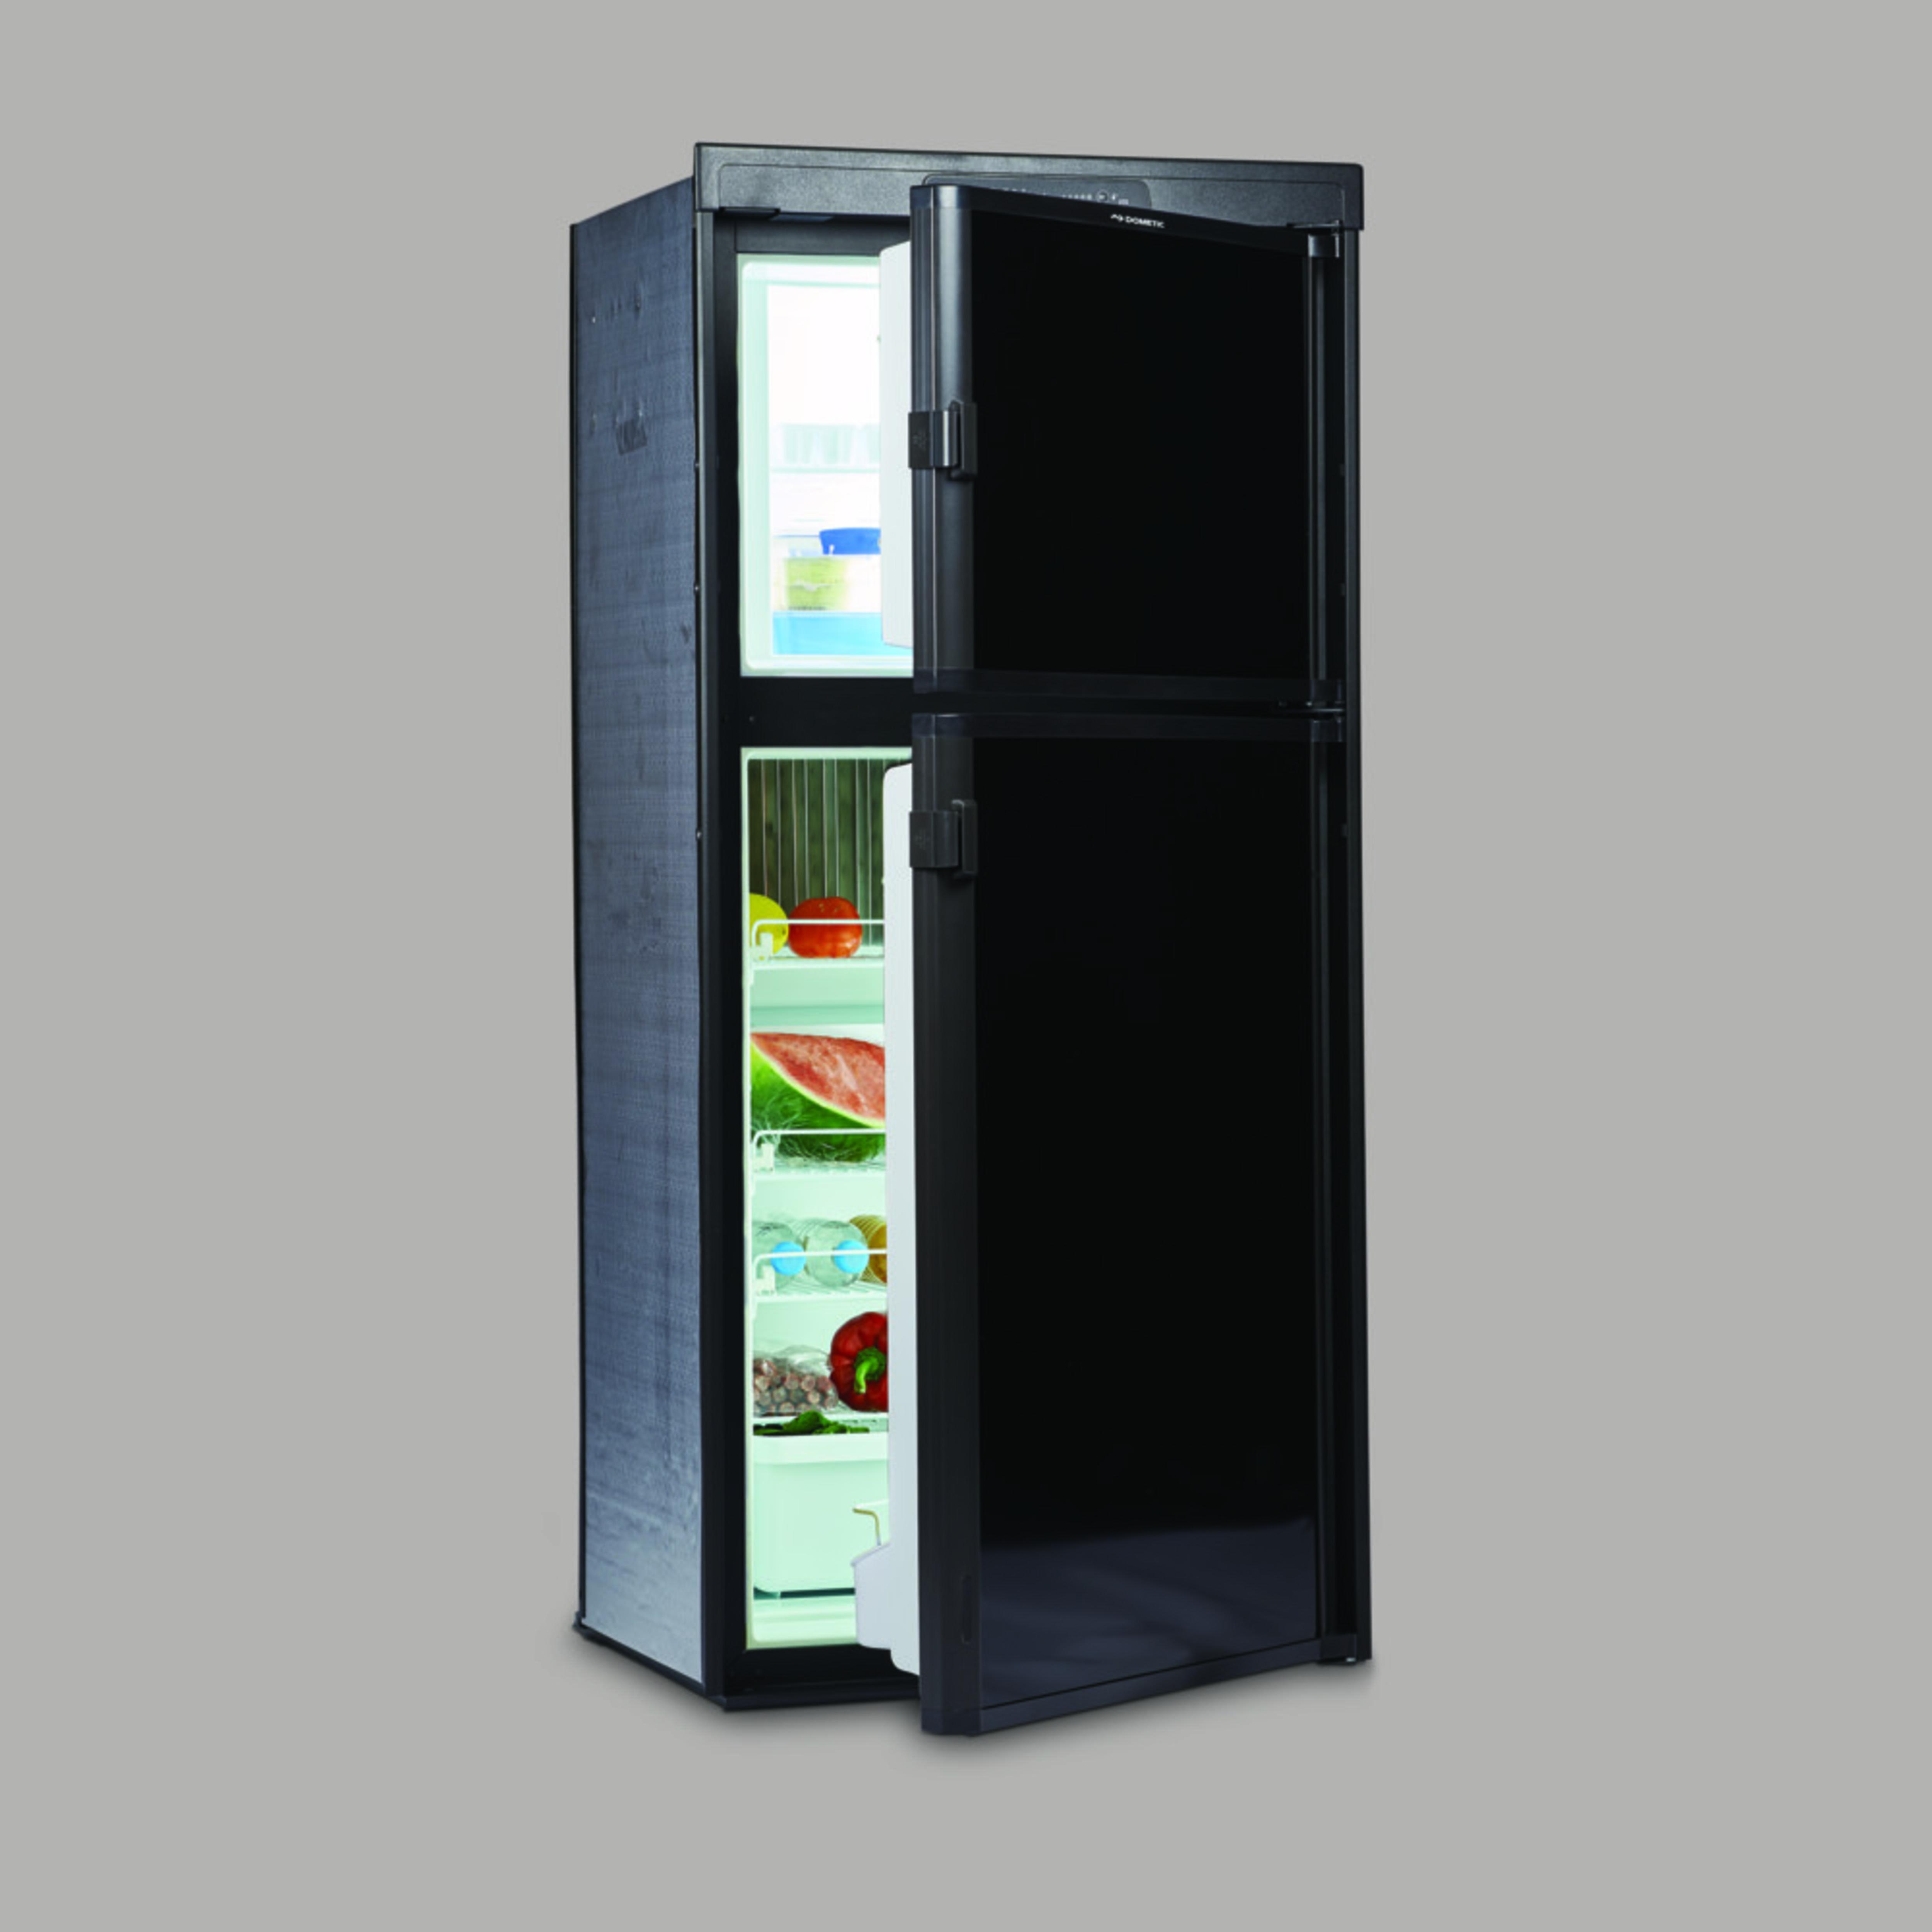 Dometic RM 4606